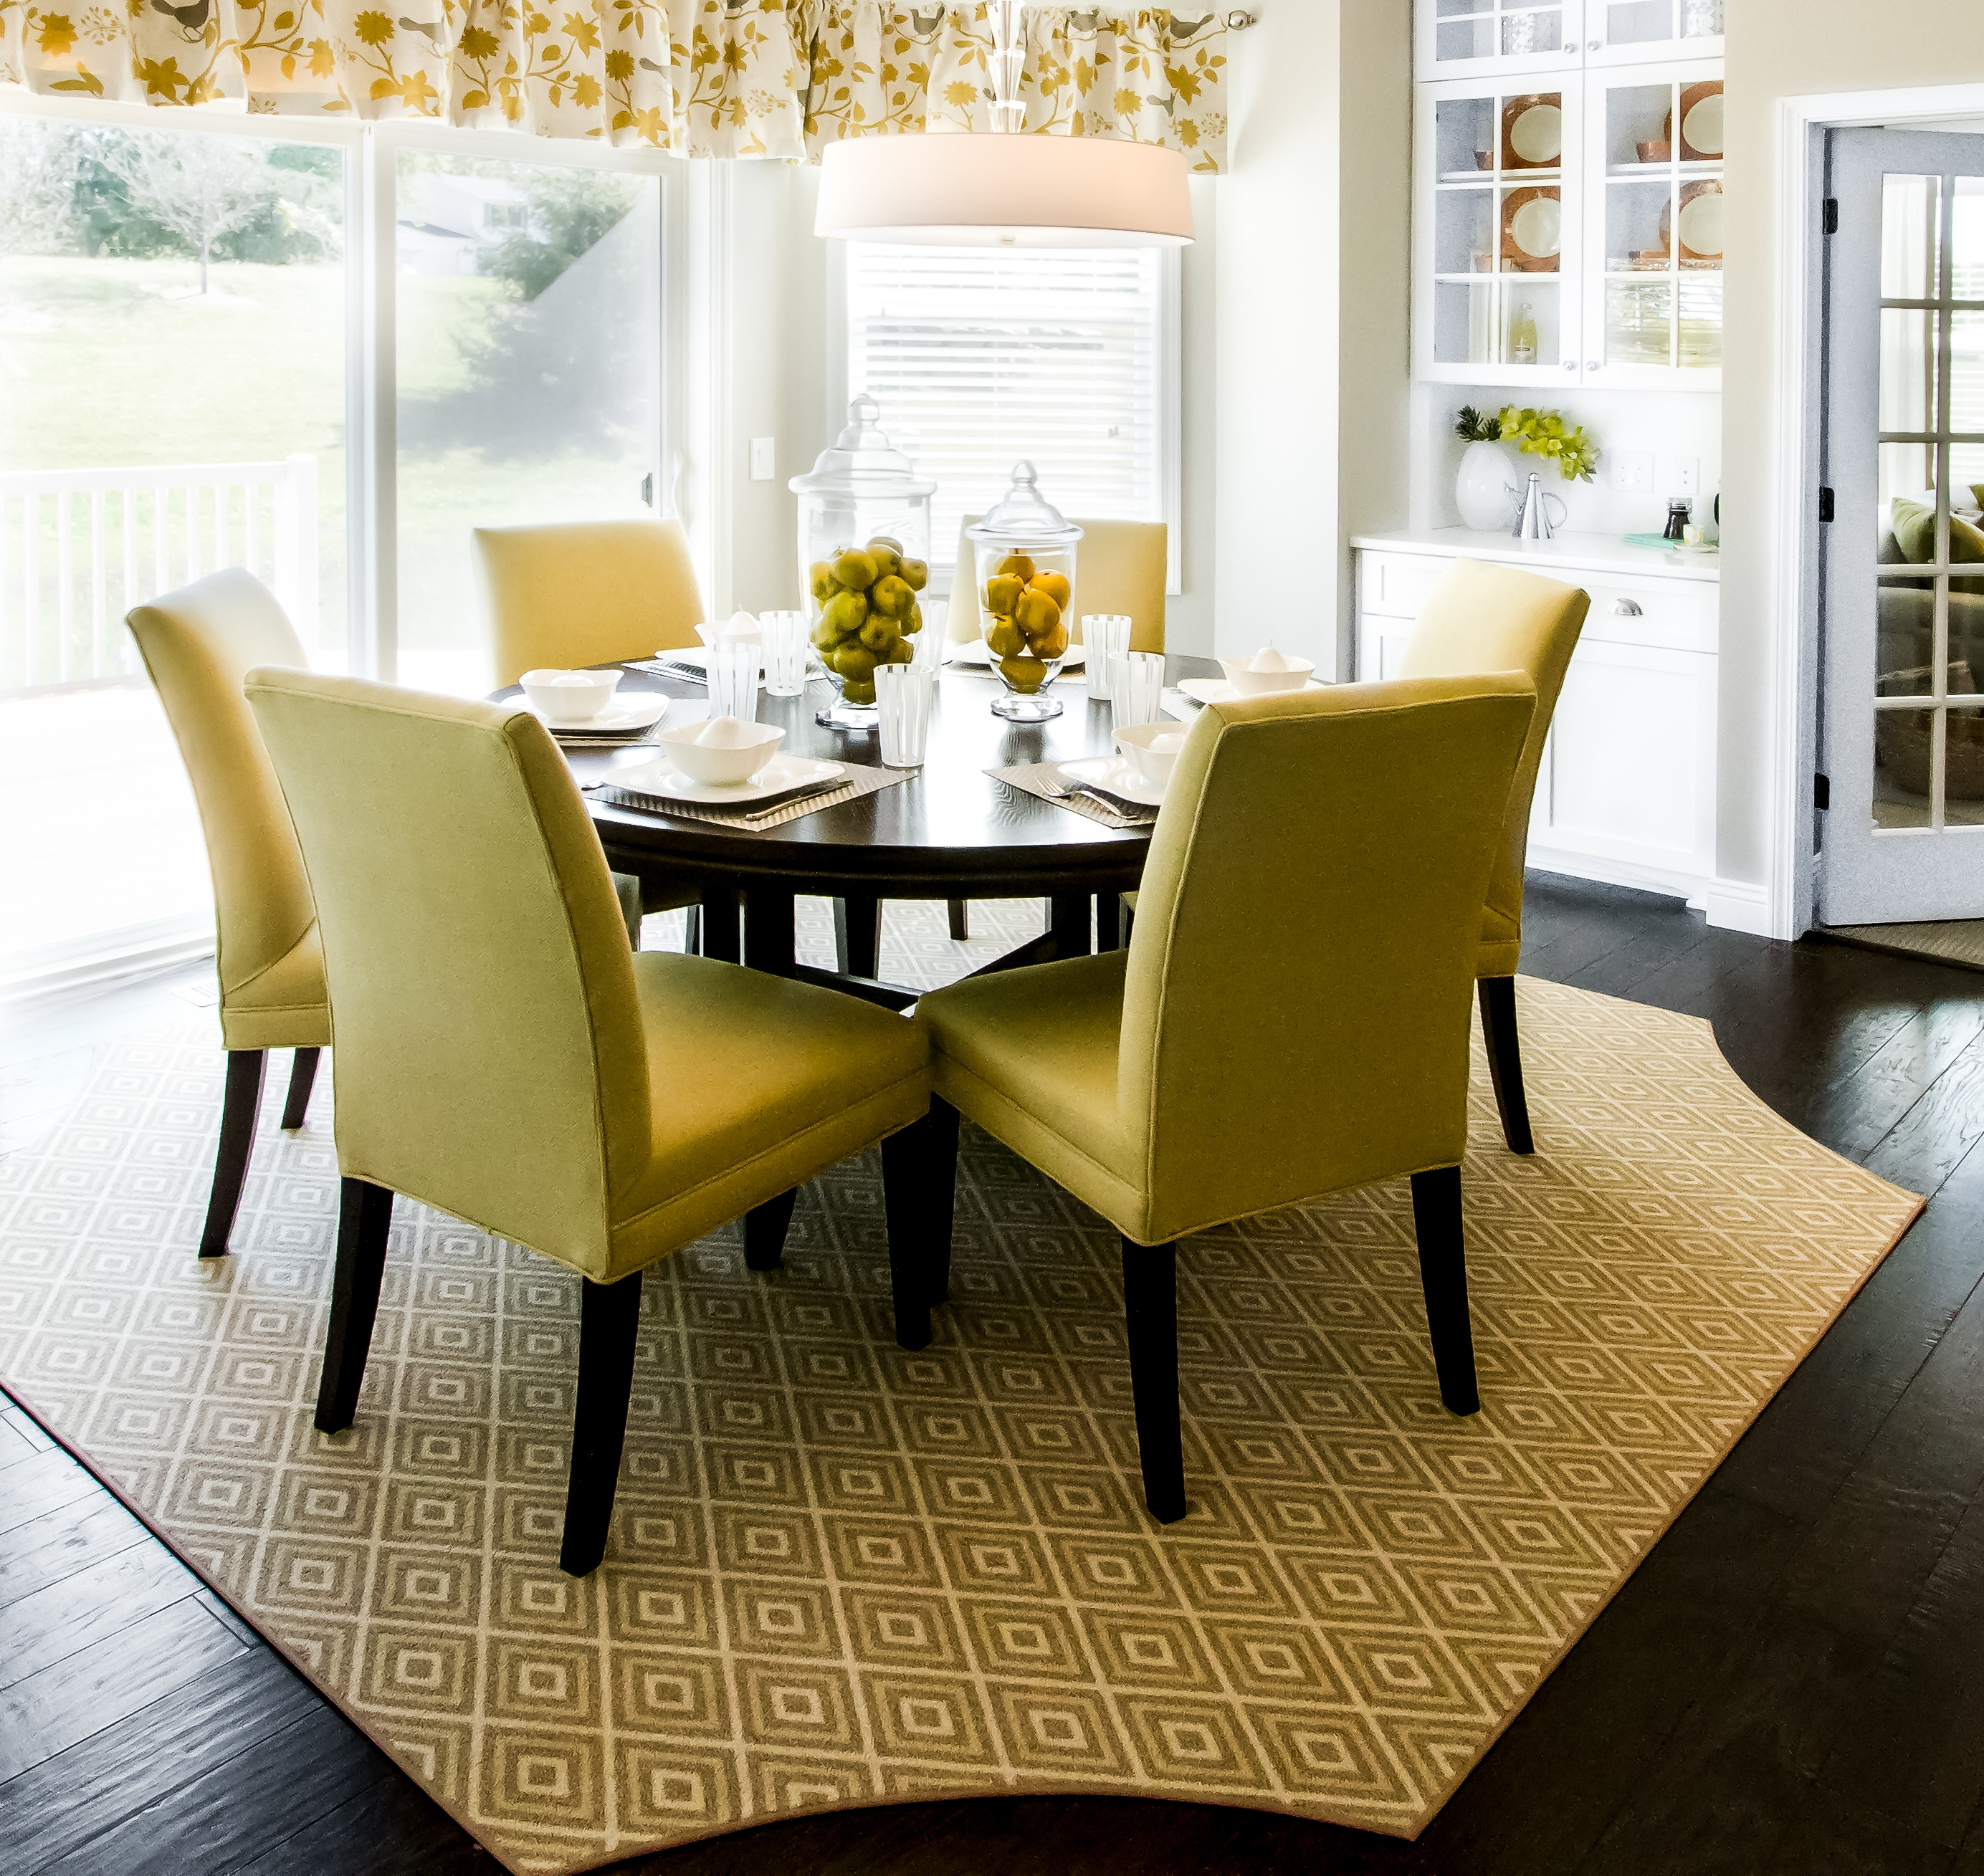 Dining room rugs